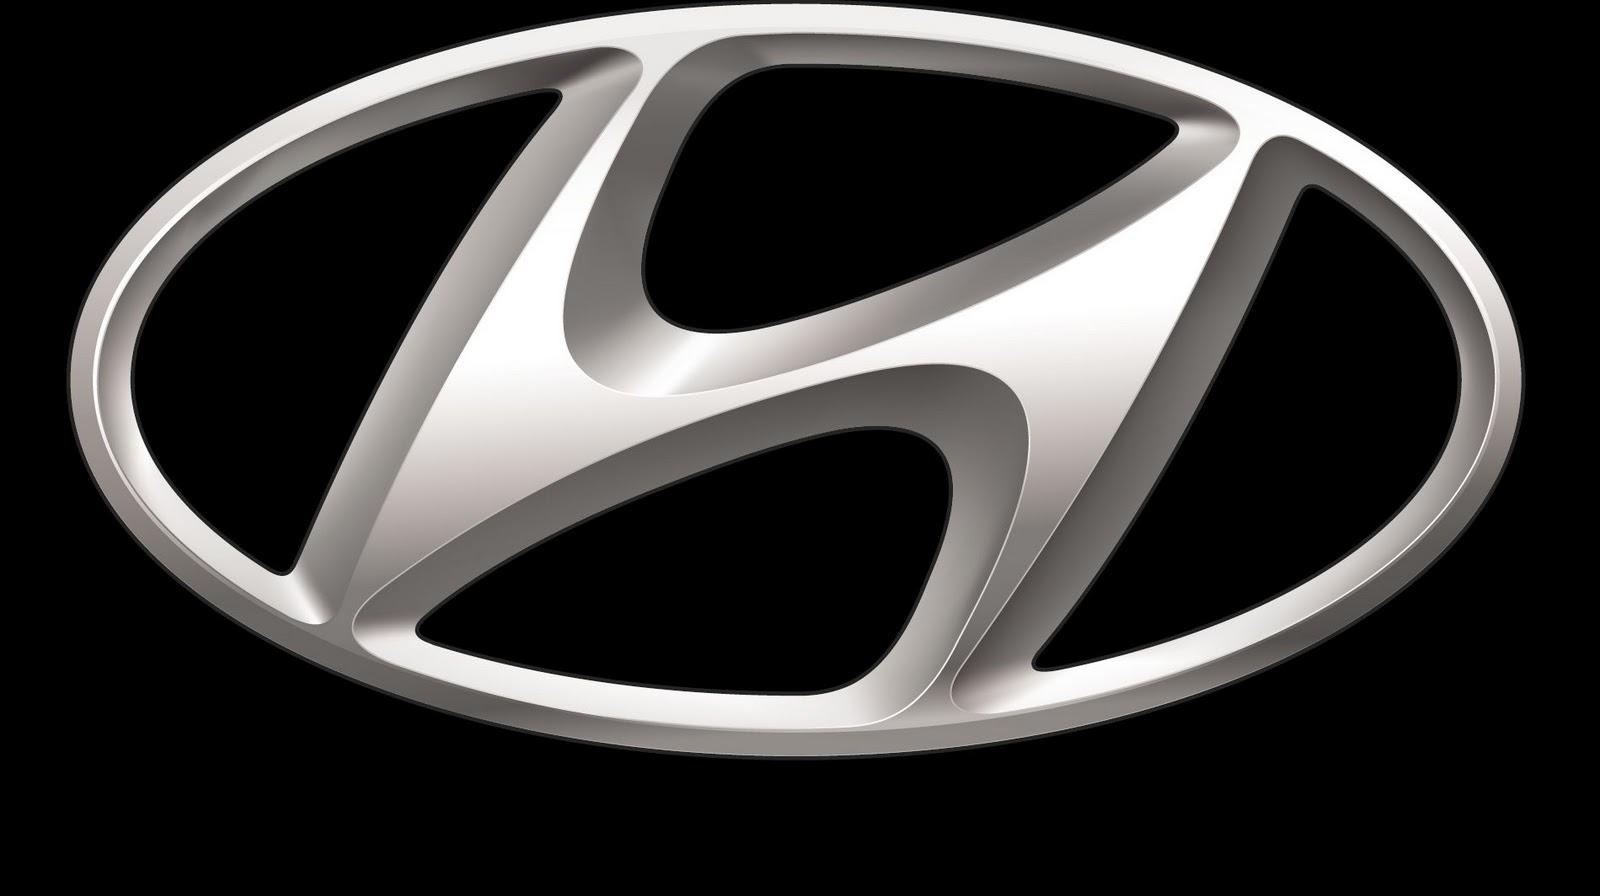 3d Car Wallpaper Hd Hyundai Logo Auto Cars Concept